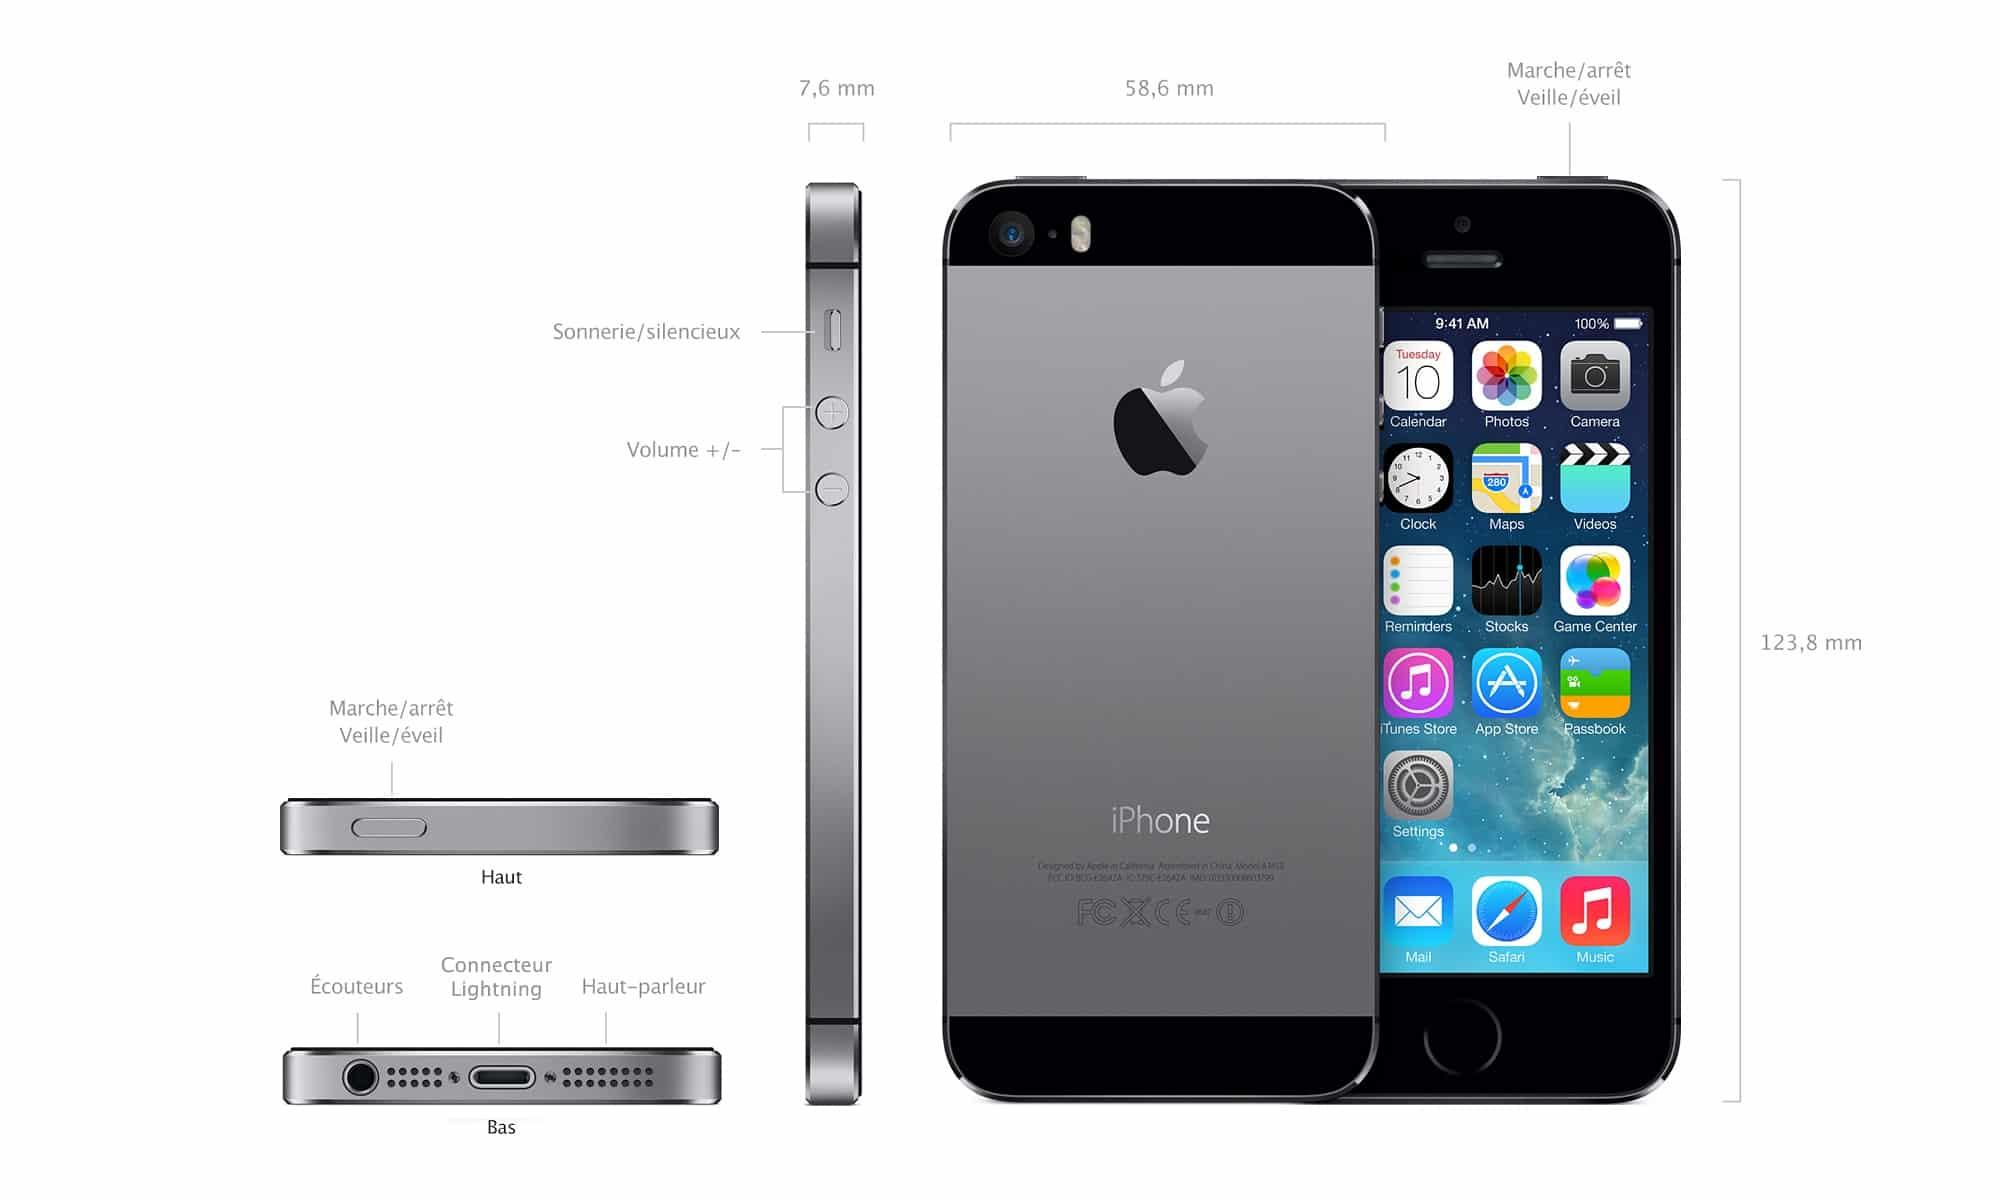 apple iphone 5s gris sid ral noir 64 go prix. Black Bedroom Furniture Sets. Home Design Ideas